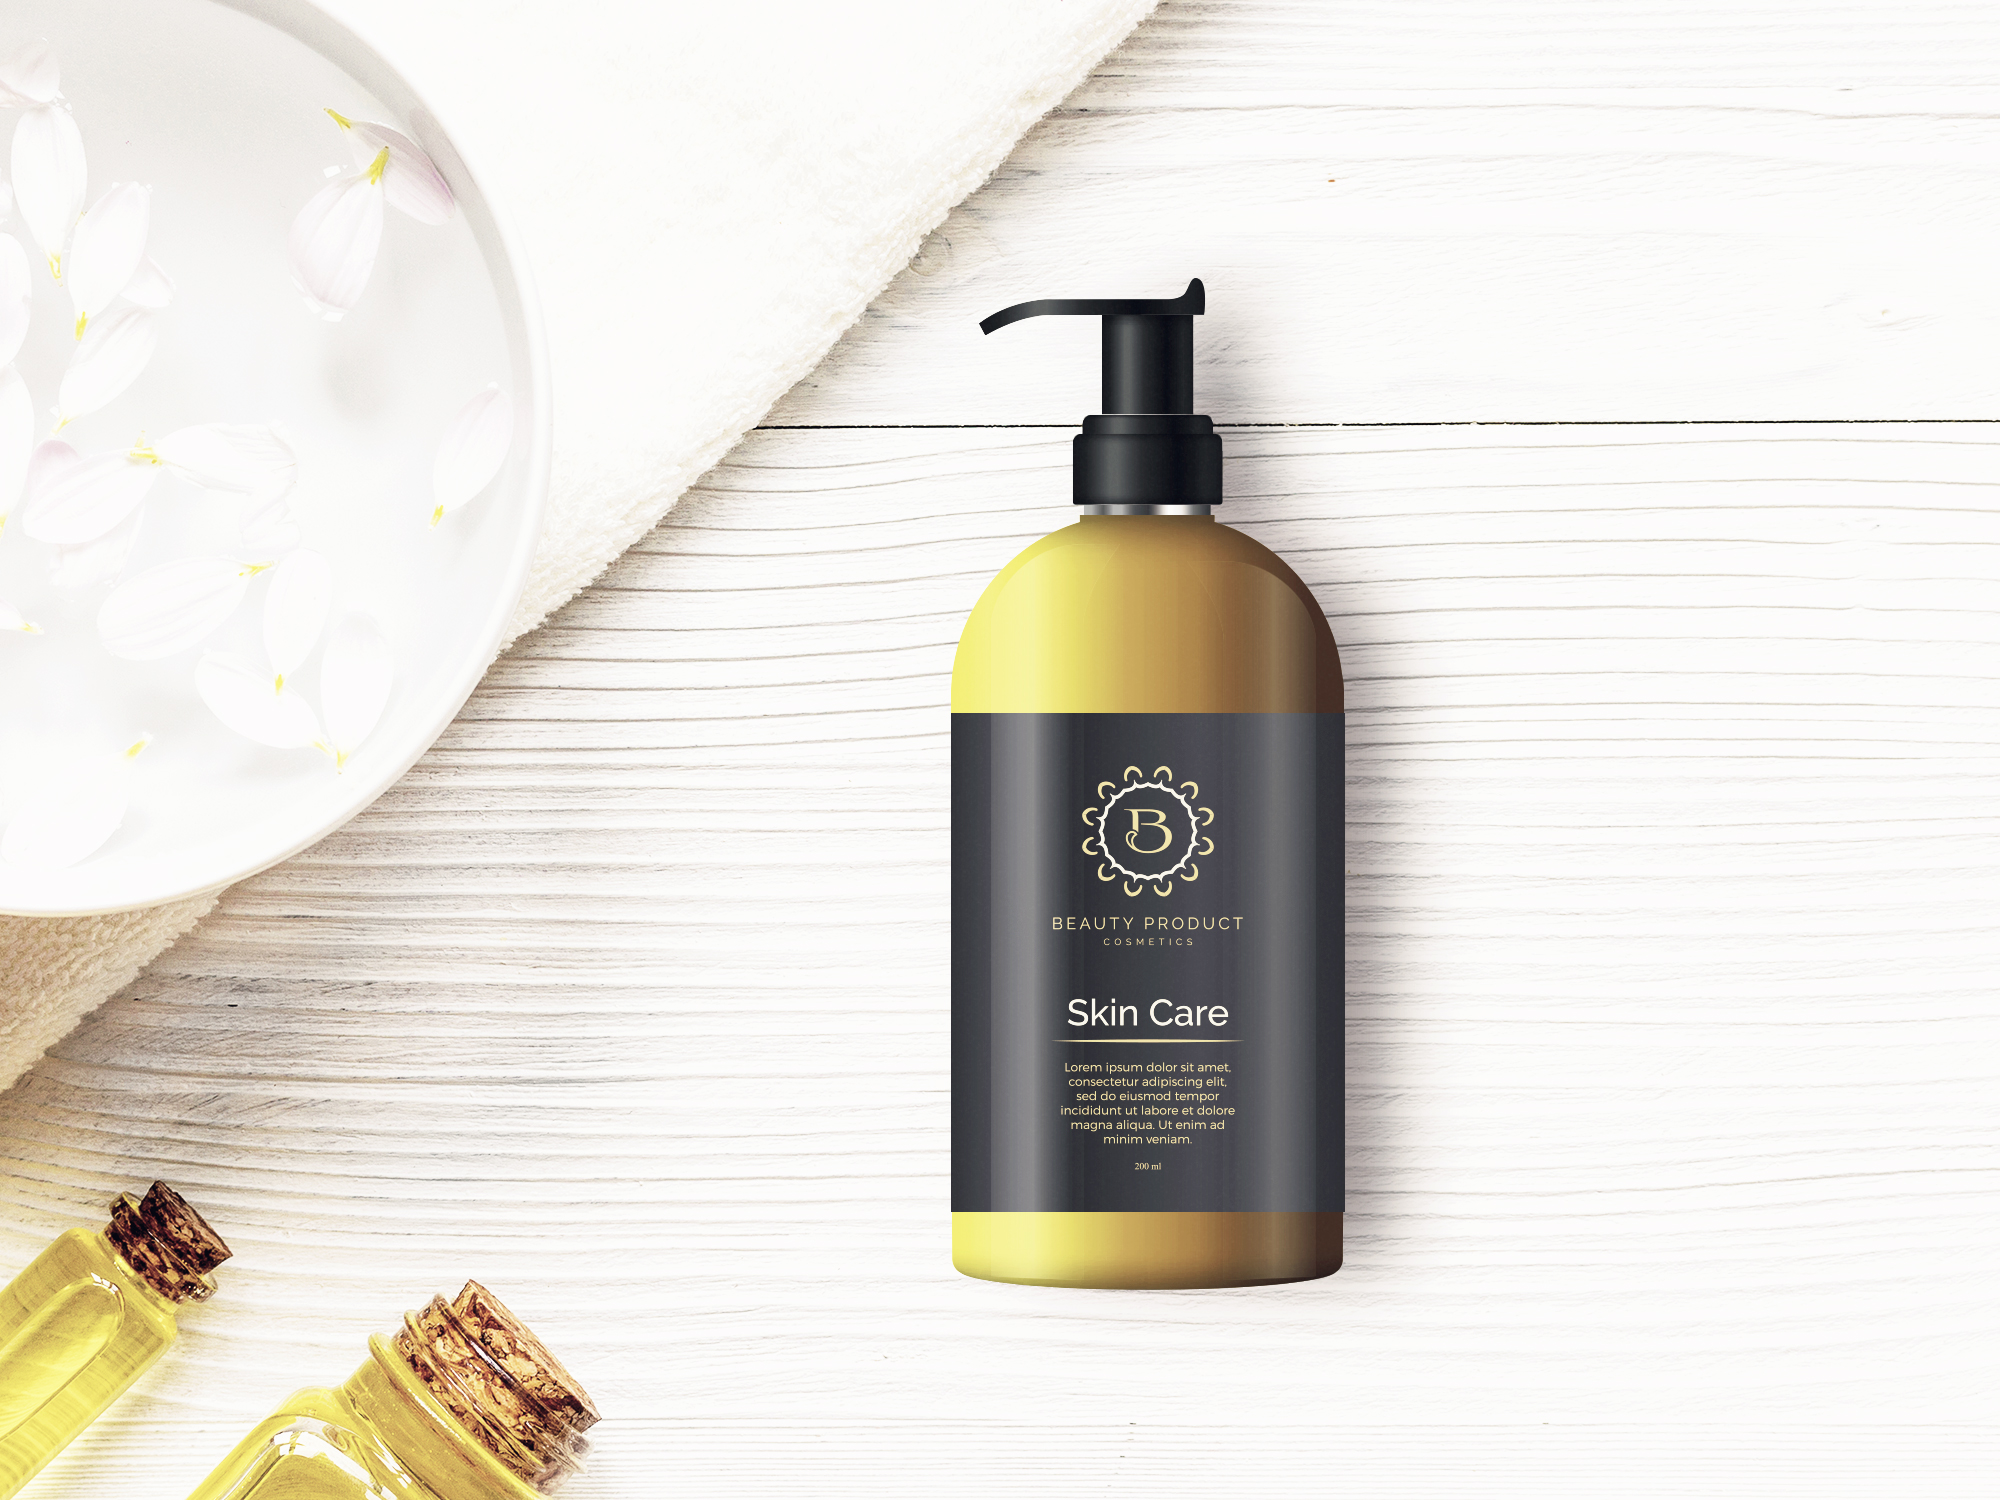 Cosmetic Bottle Mockup, Shampoo and Oil Bottle mock up example image 5